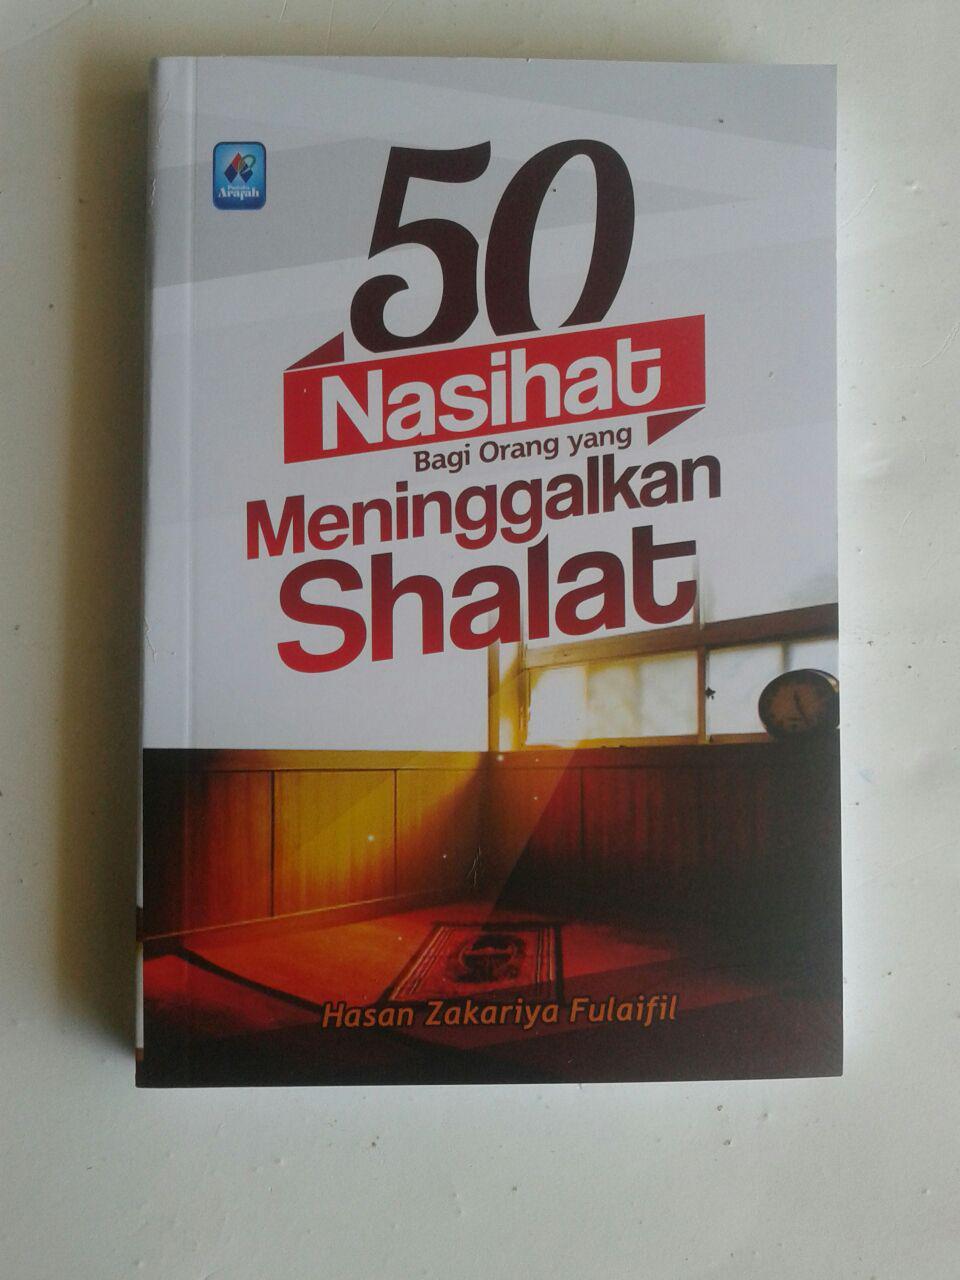 Buku Saku 50 Nasihat Bagi Orang Yang Meninggalkan Shalat cover 2